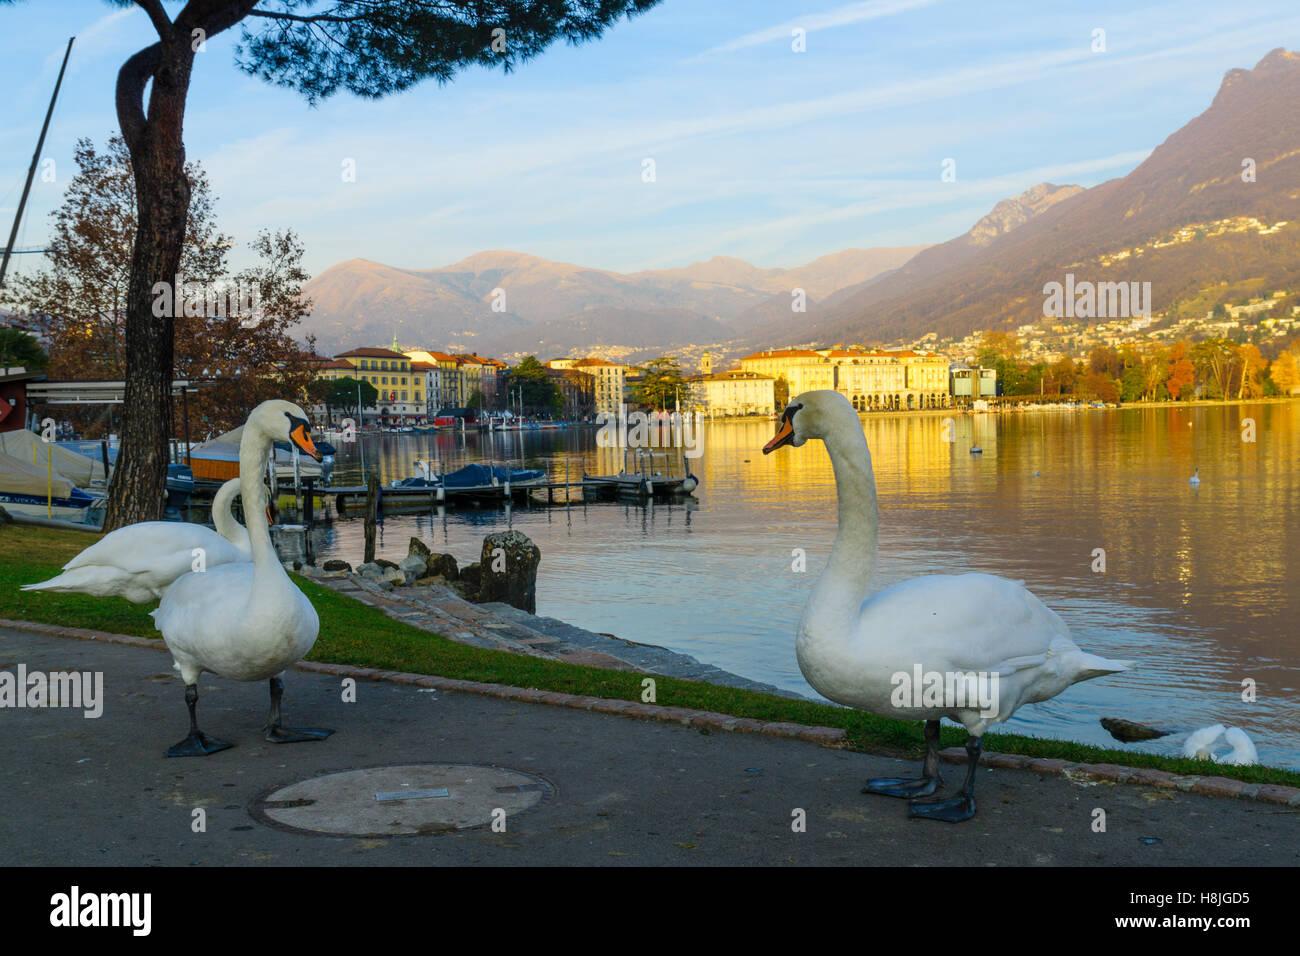 Swans on the lakeside promenade, at sunset, in Lugano, Ticino, Switzerland Stock Photo